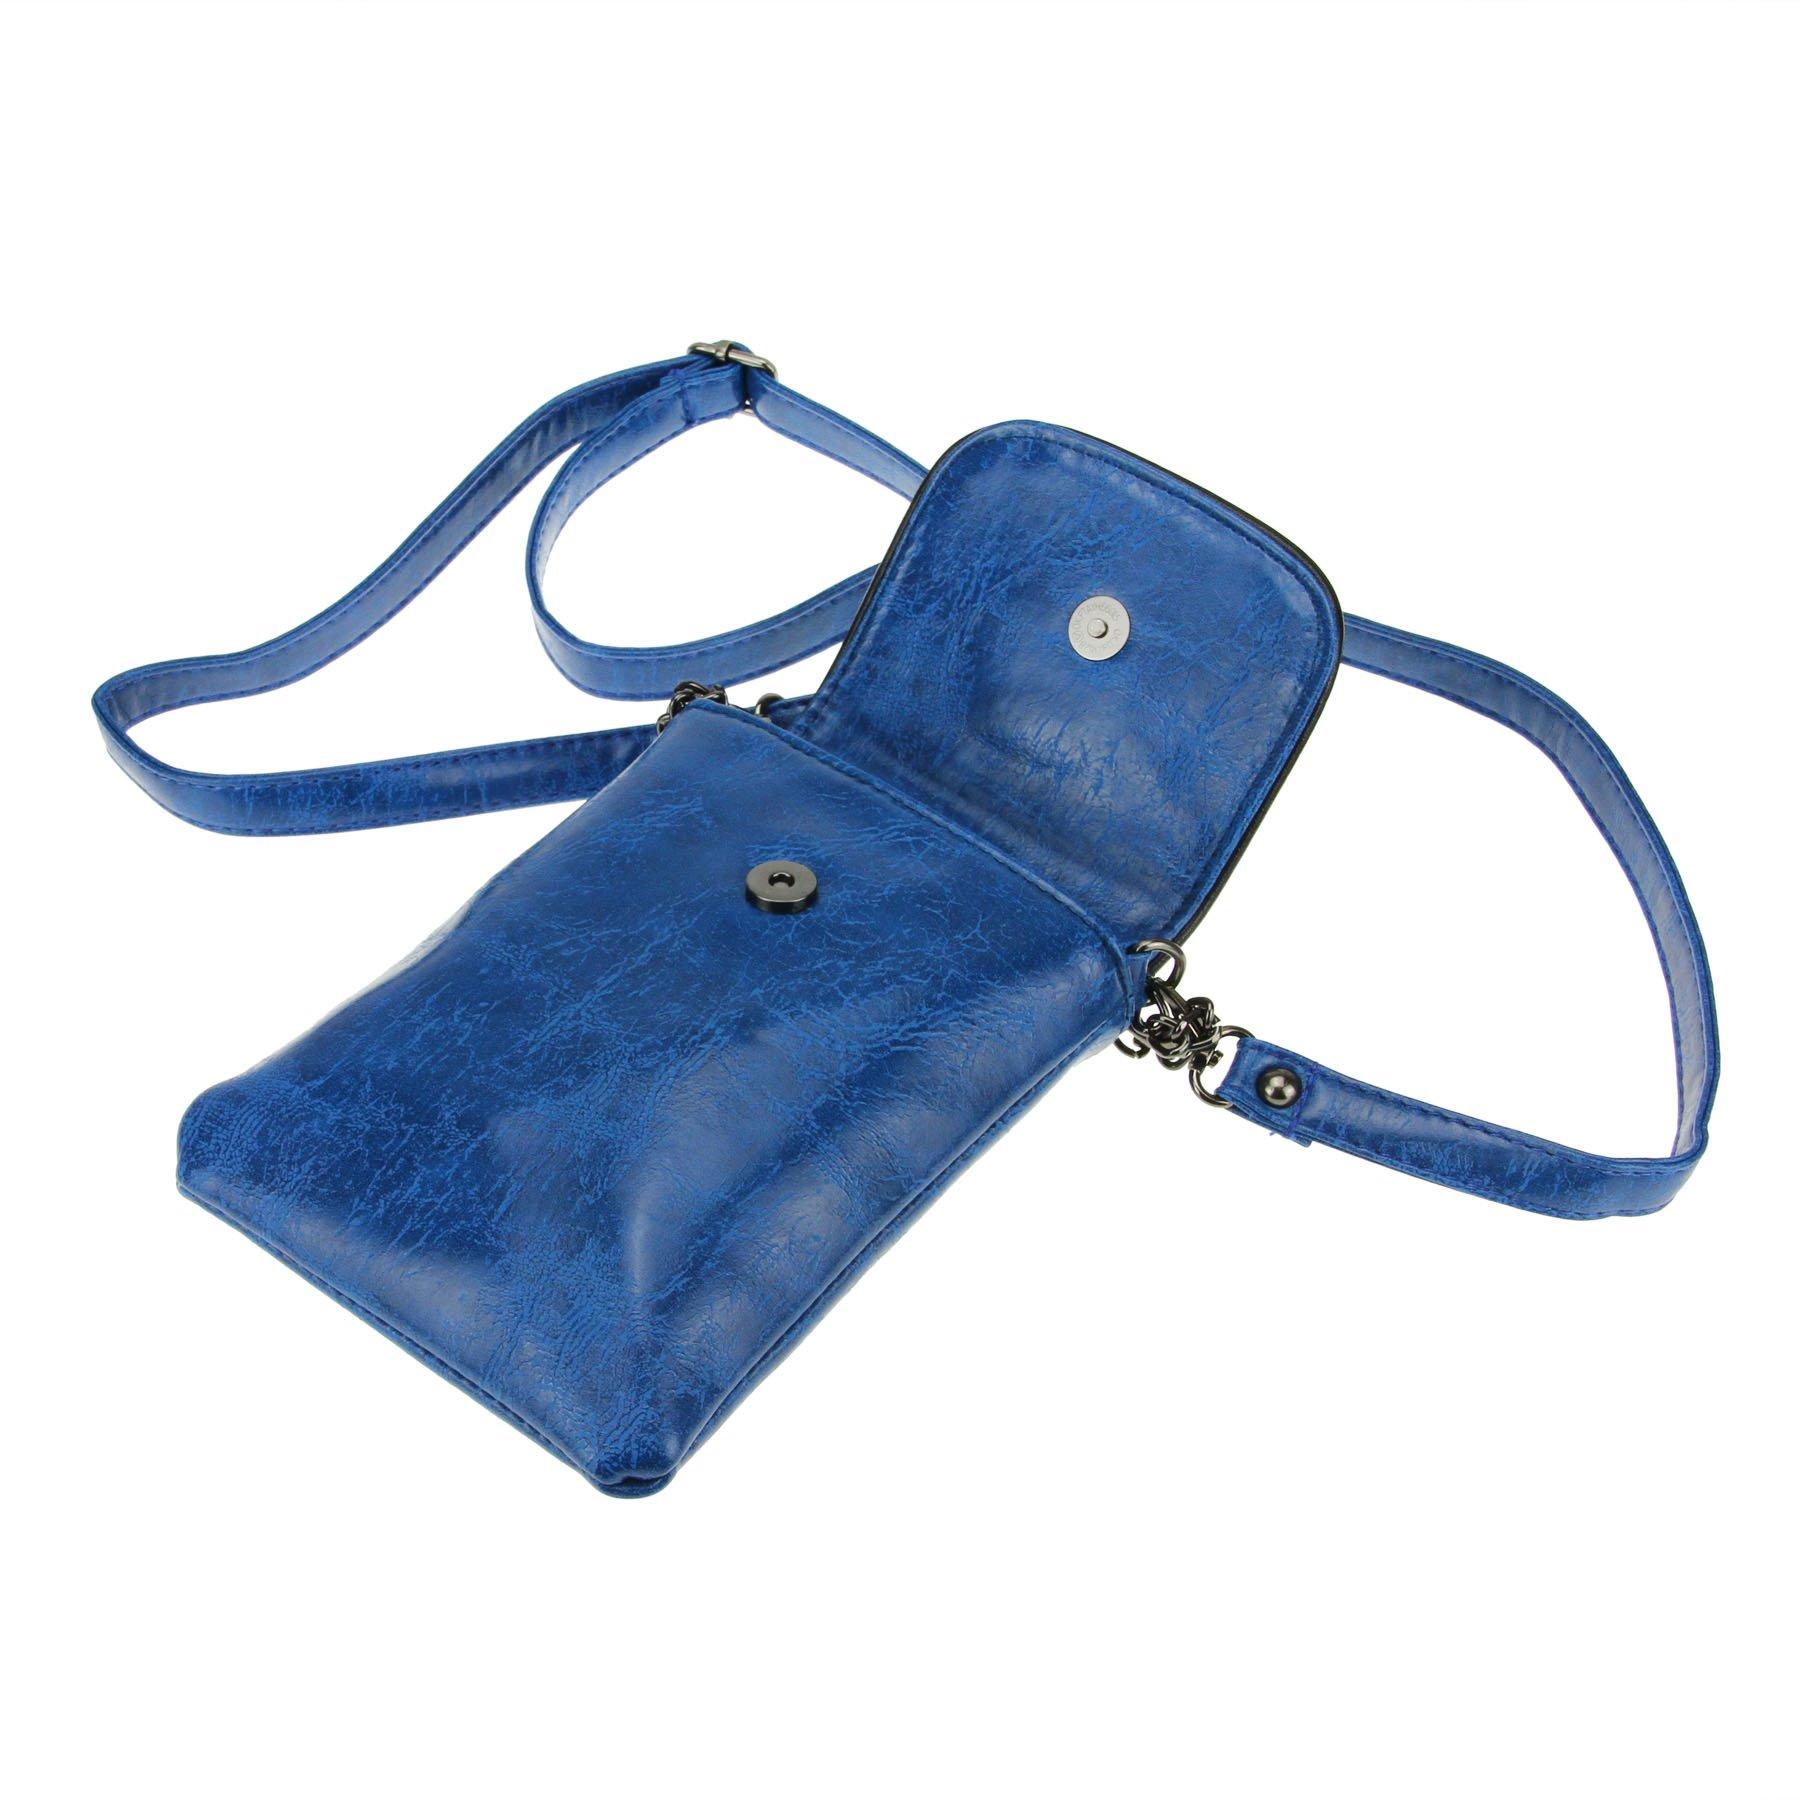 Studded Skull Gothic Mini Chain Crossbody Shoulder Bag Satchel Travel Leather Tote Handbag Purse by Fakeface (Image #5)